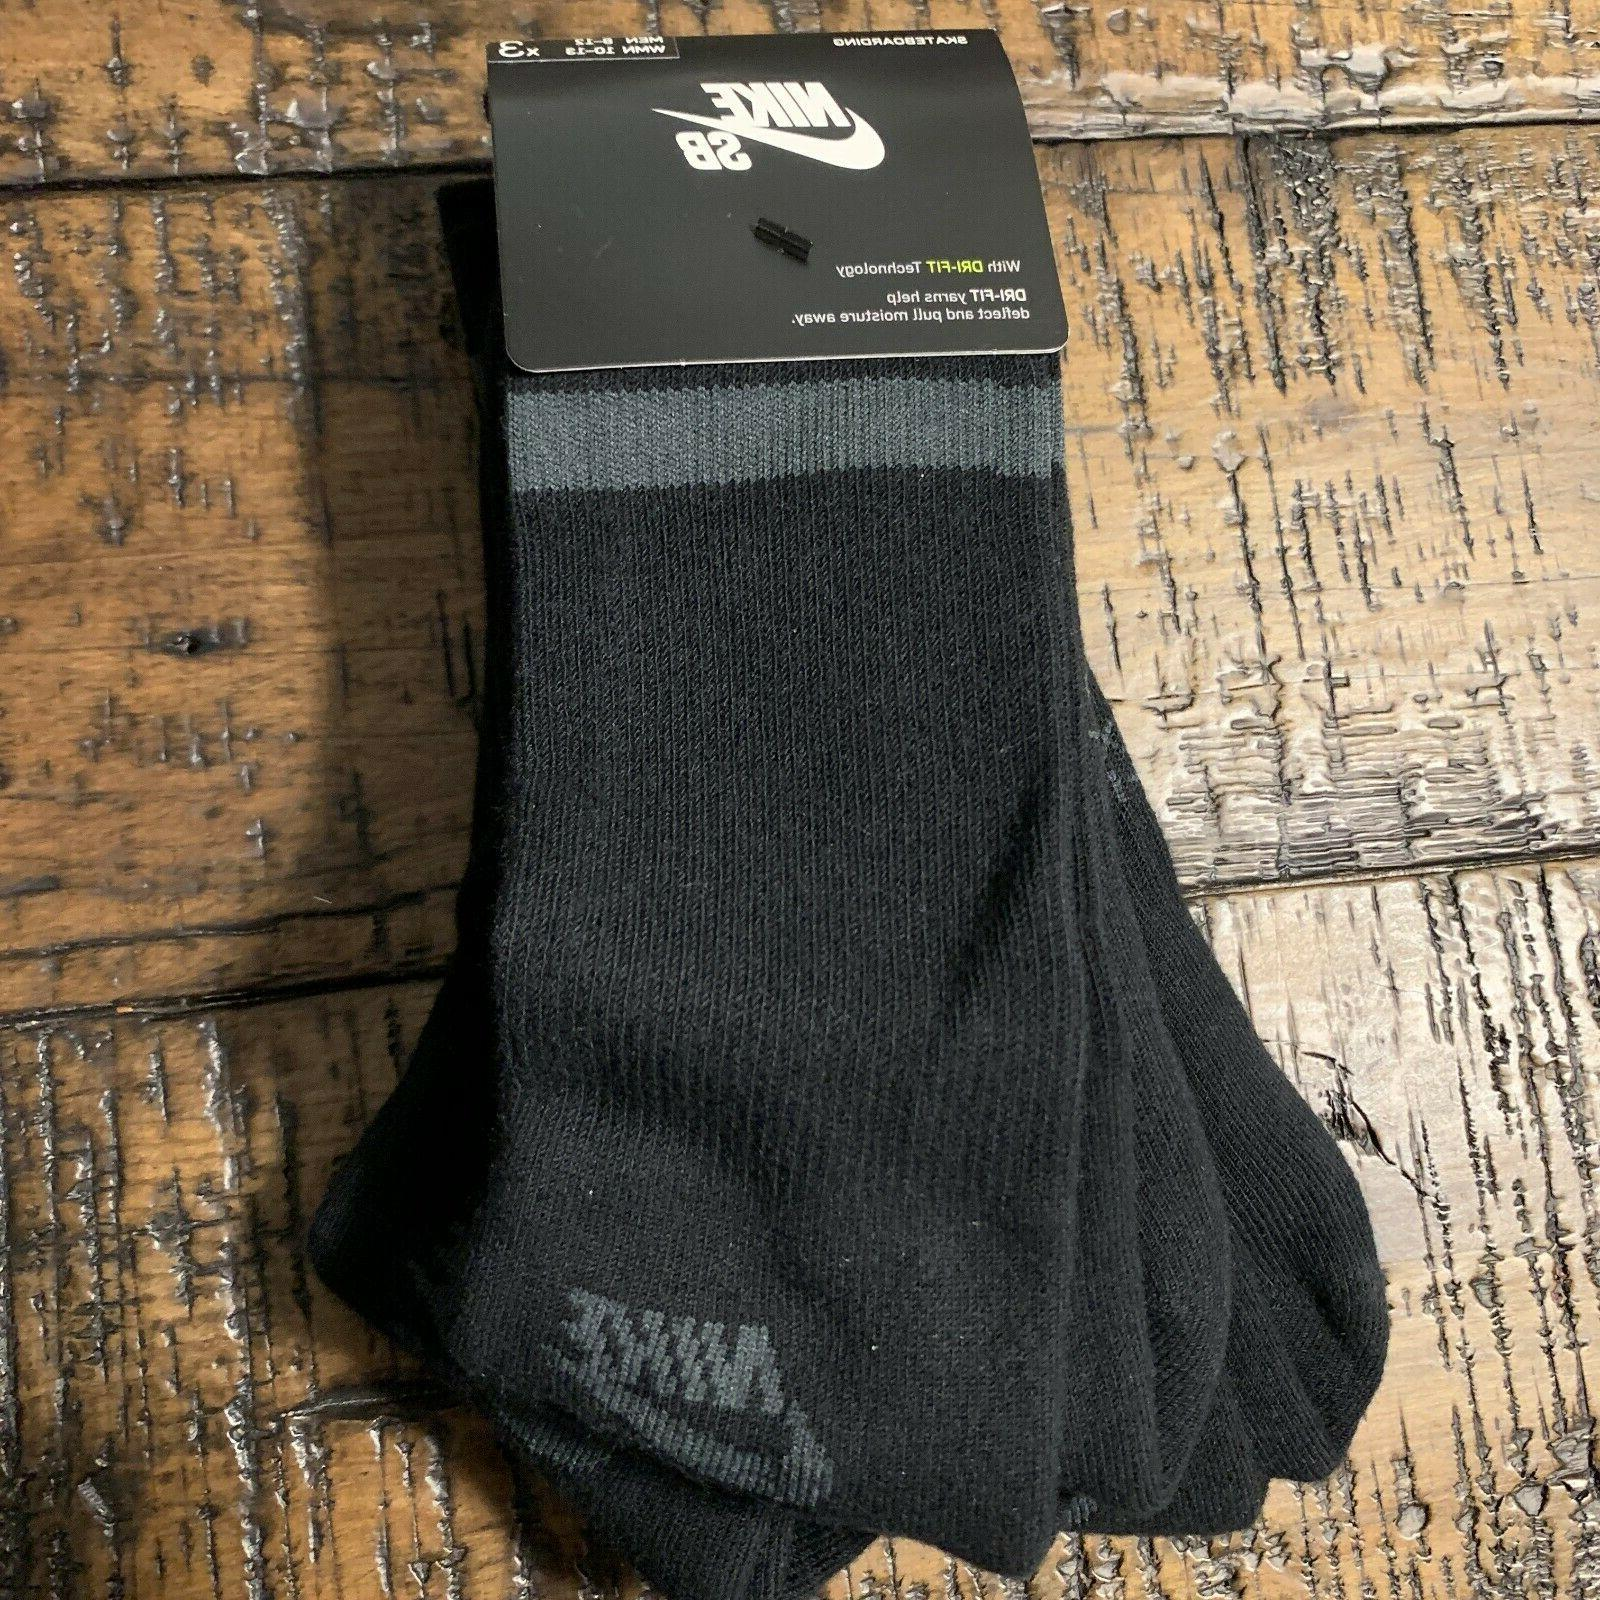 Nike SB Skateboarding Men's Crew Socks Pack Pairs SX5760-010 SZ L